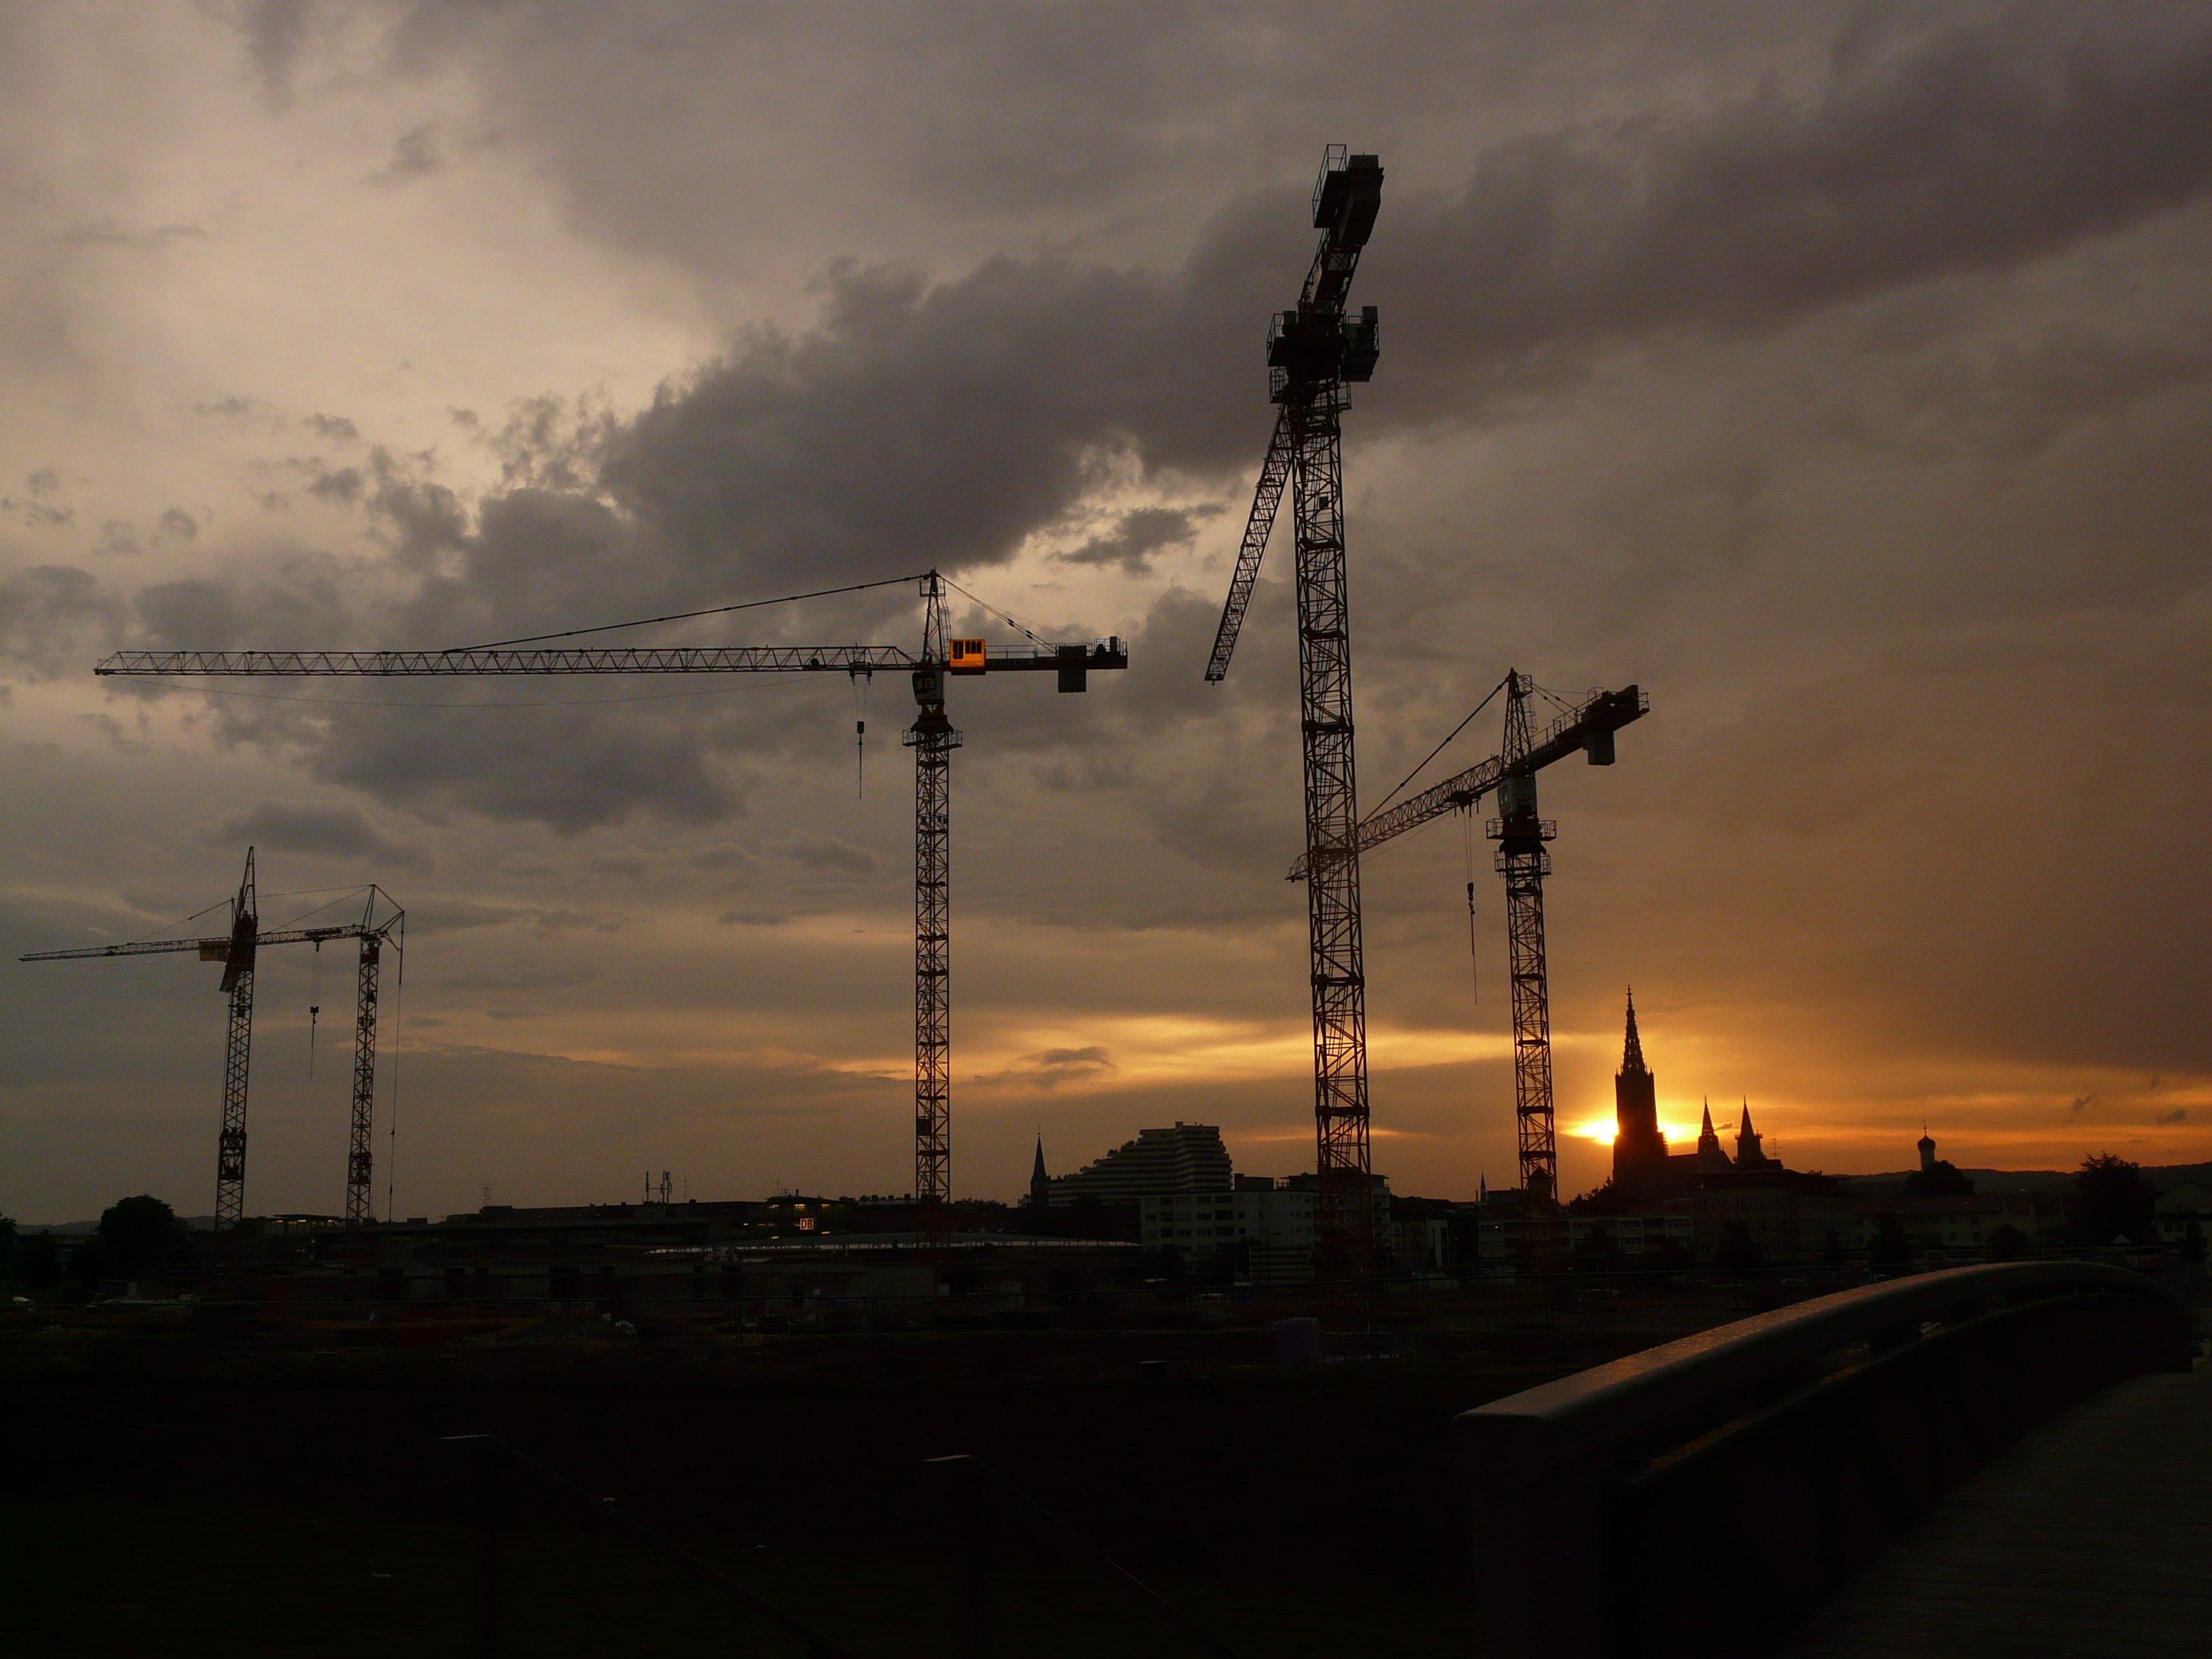 Free Images : light, cloud, sky, technology, sunrise, sunset